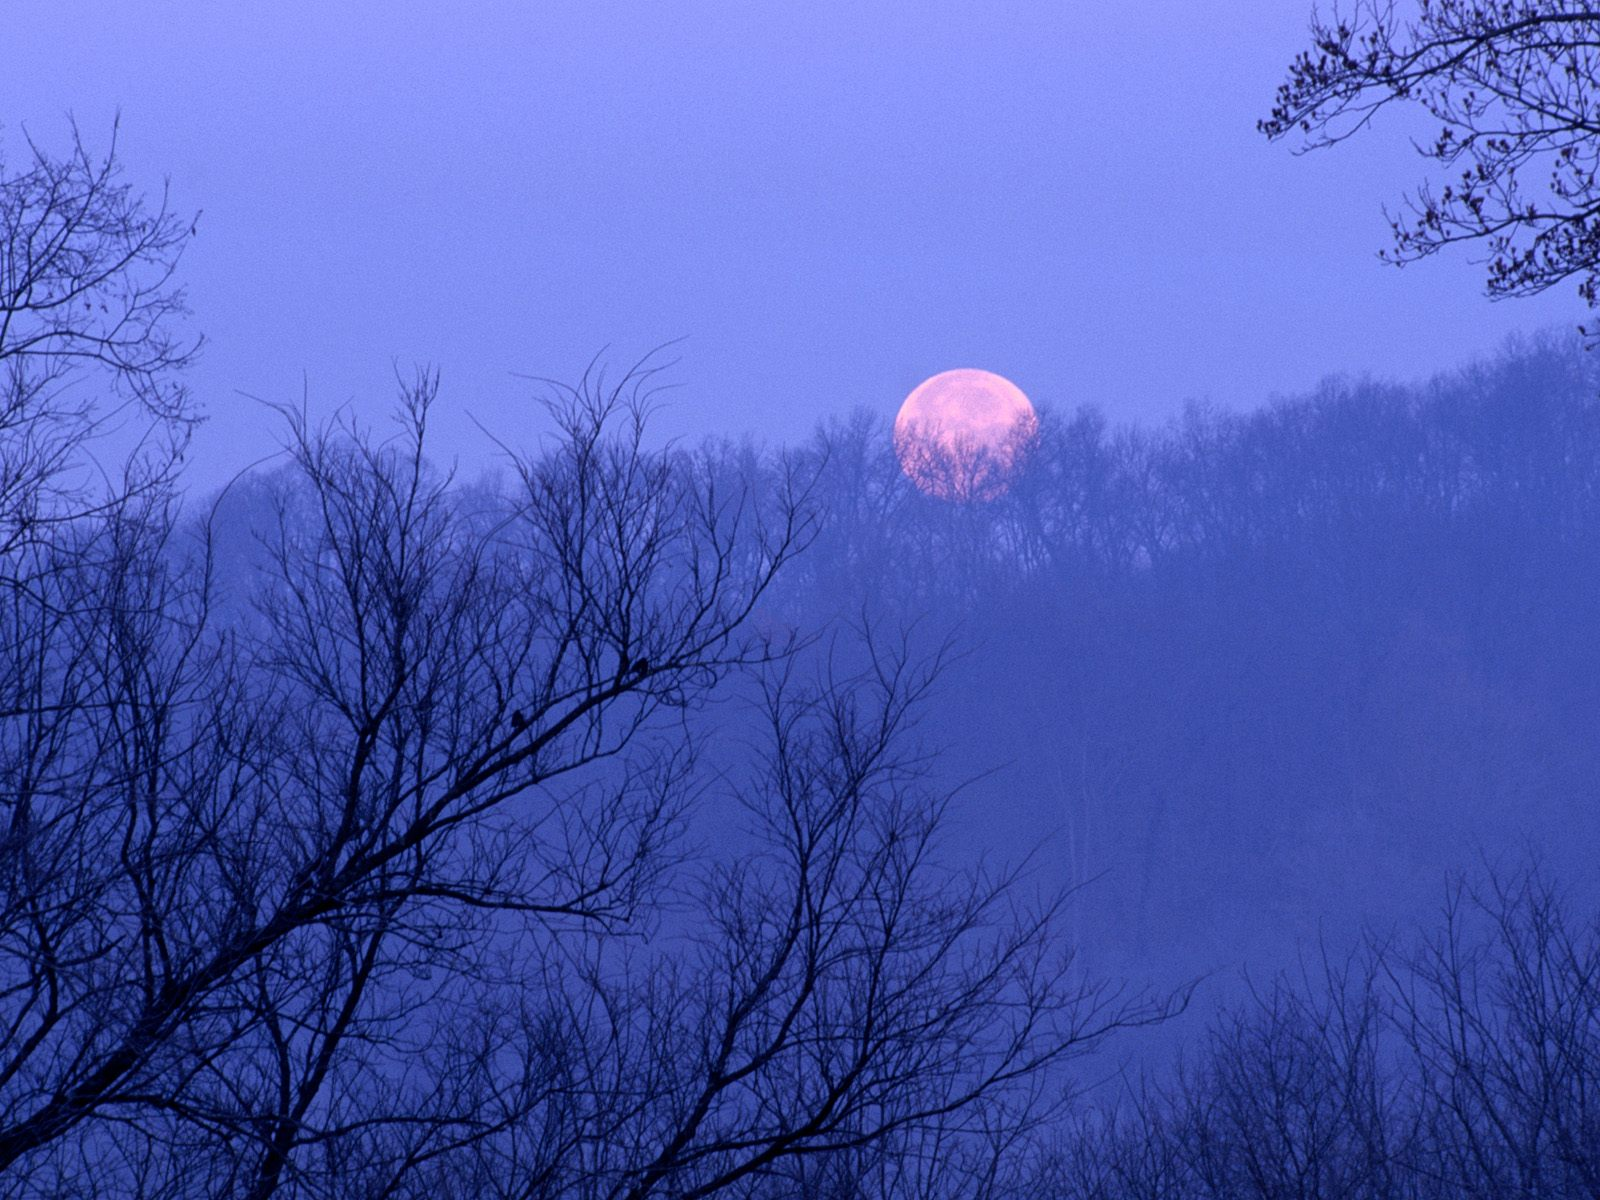 http://1.bp.blogspot.com/_8_CLn-I1Tfc/TUWyBCn6Q1I/AAAAAAAABt4/8dYiVHppGBQ/s1600/Full+Moon+Setting%252C+Percy+Warner+State+Park%252C+Tennessee.jpg